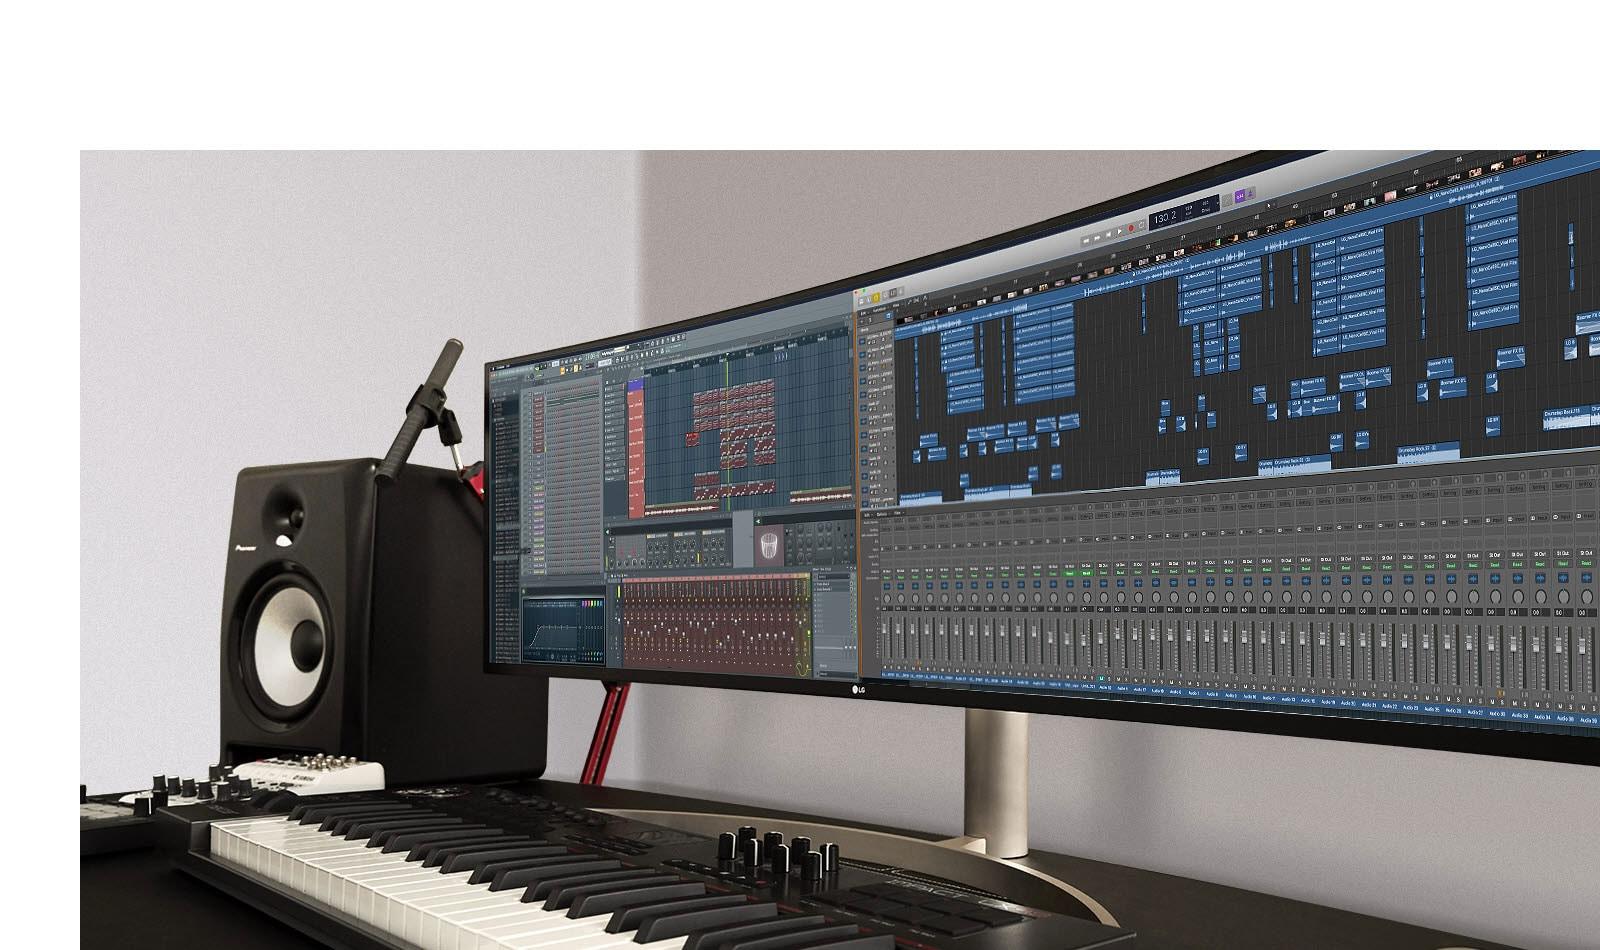 MNT-49WL95C-05-1-Sound-Content-Desktop